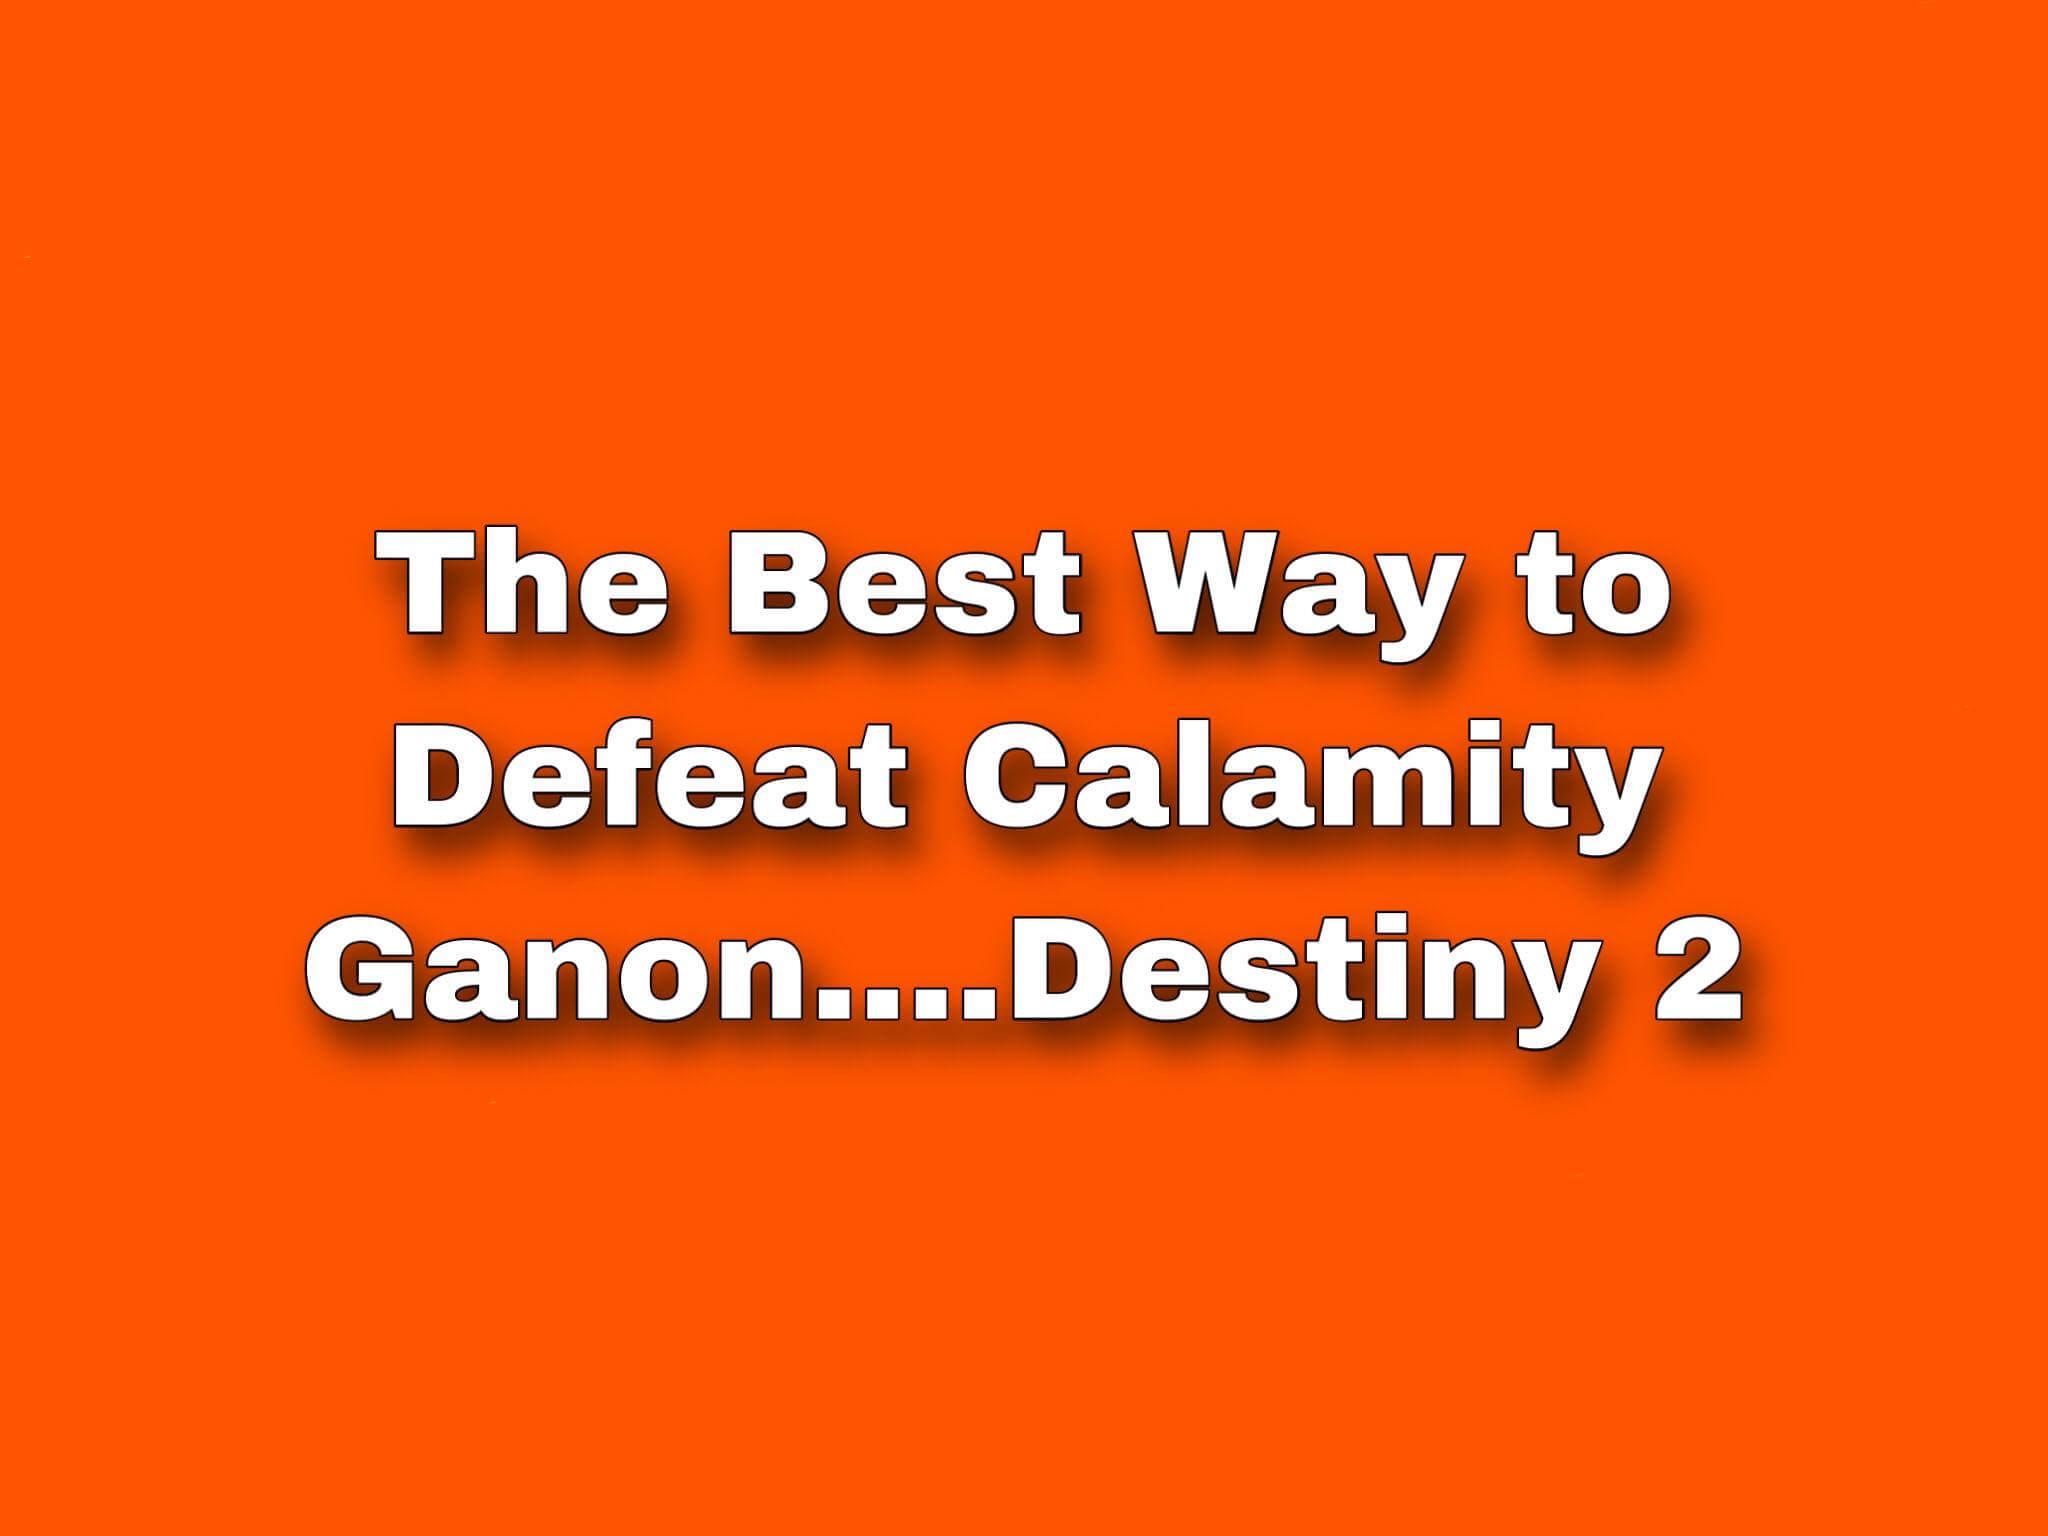 https://shyoz.com/wp-content/uploads/2021/02/The-Best-Way-to-Defeat-Clamity-Ganon..jpg